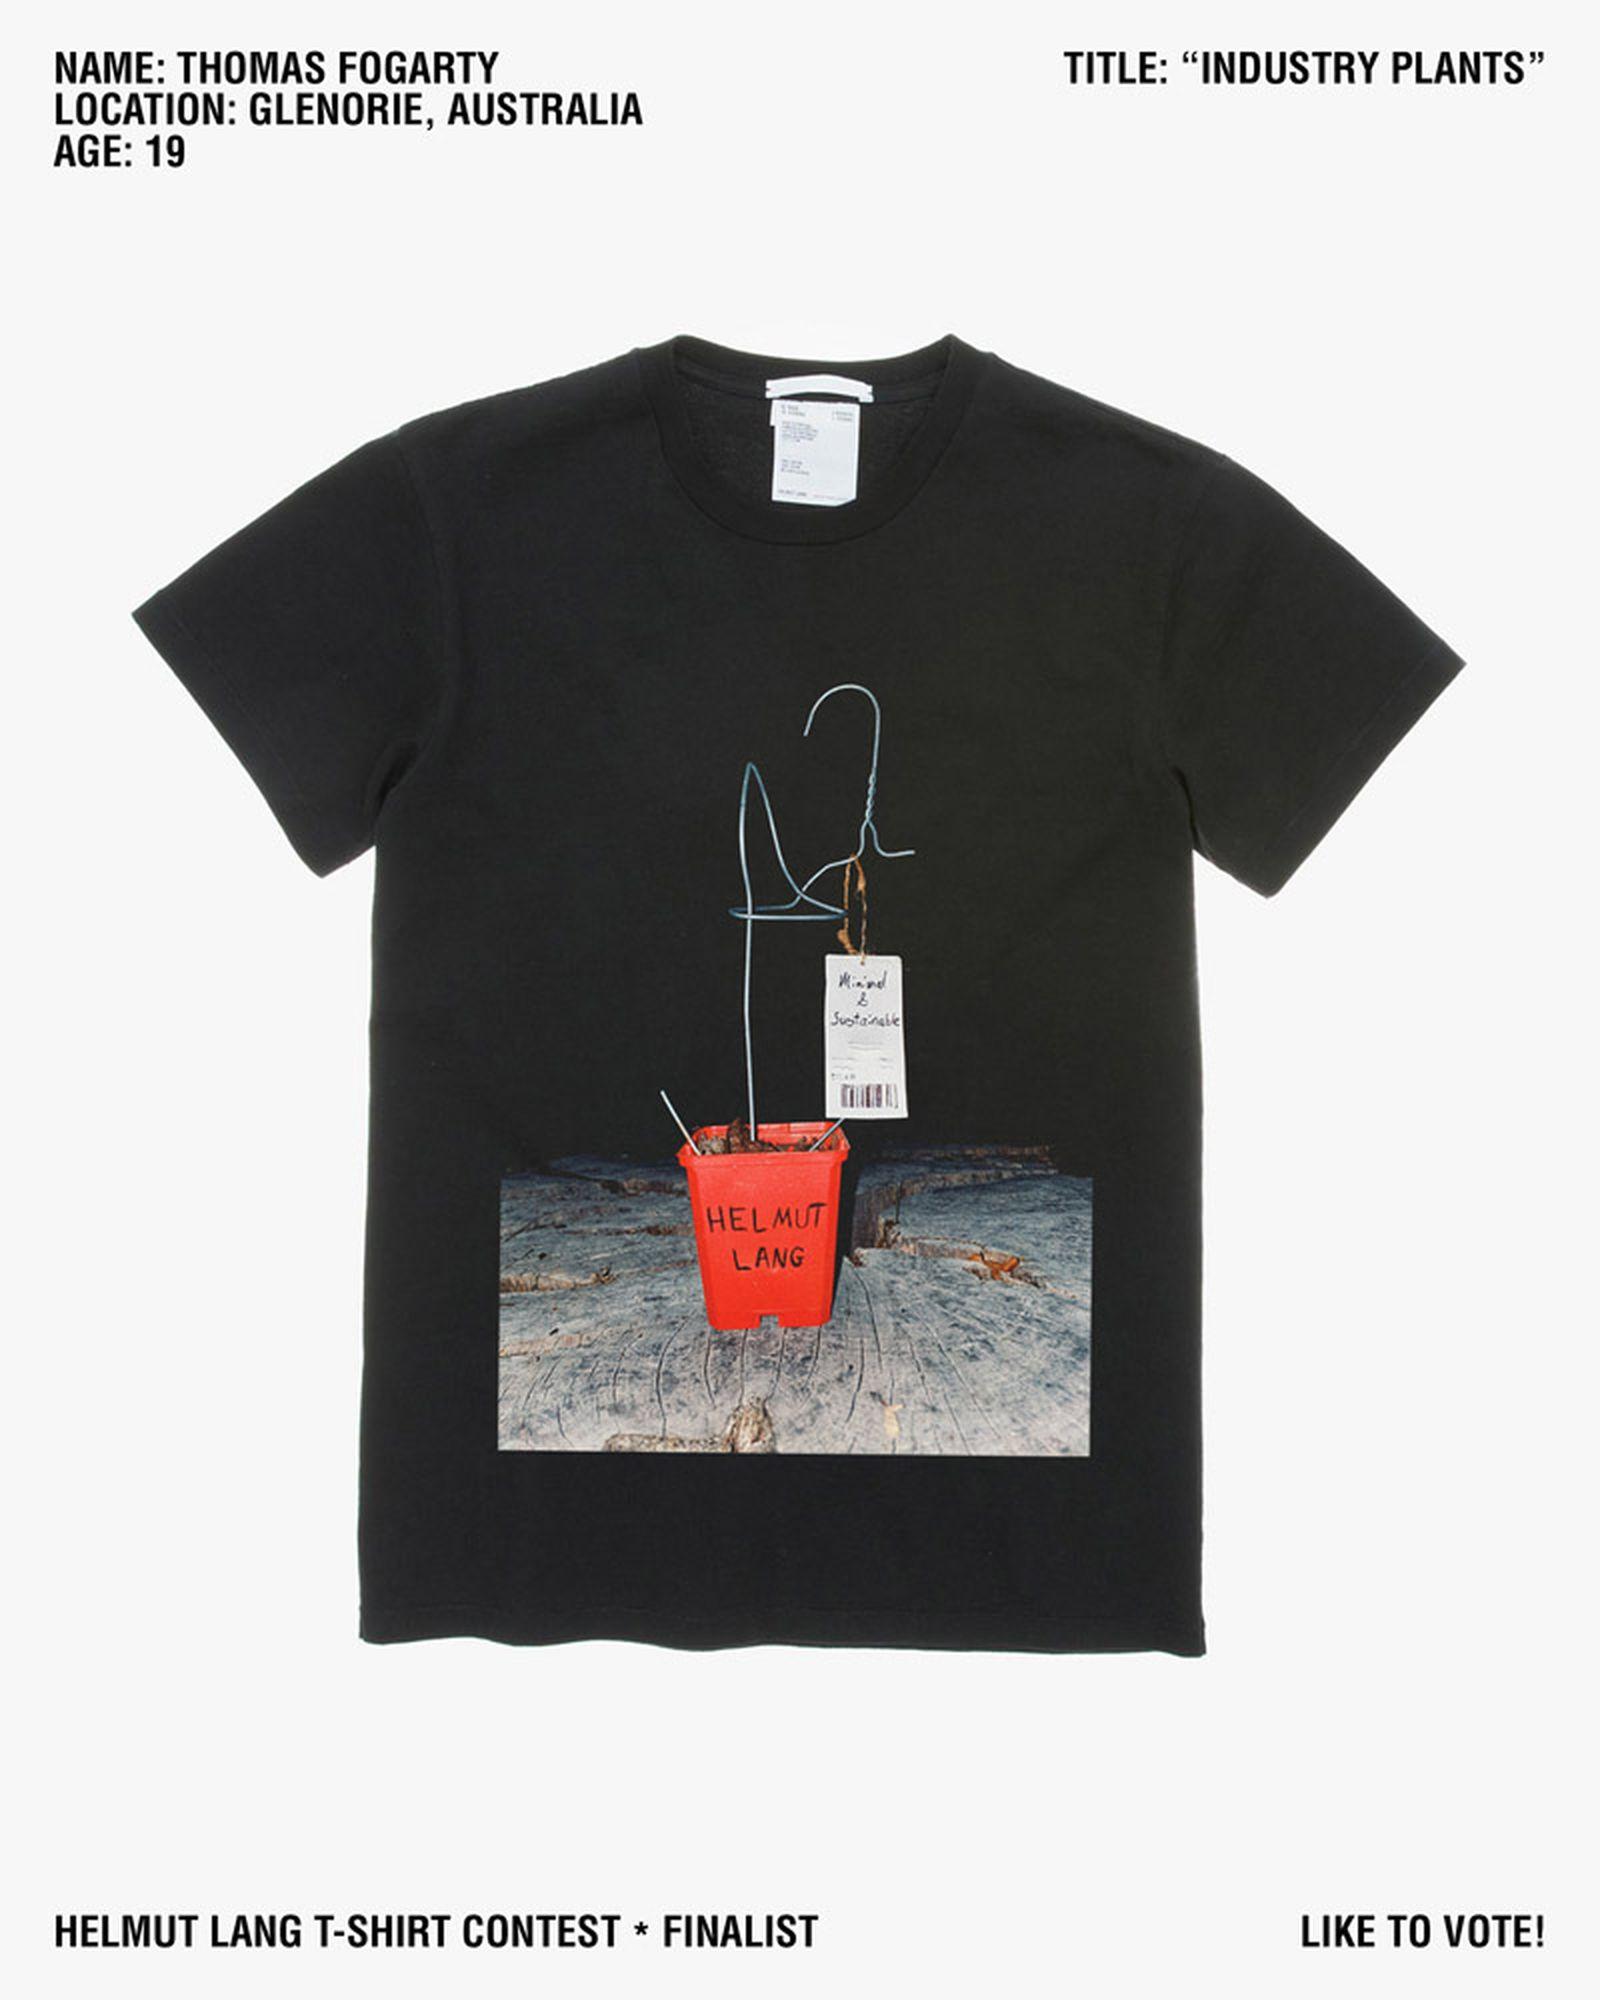 21helmut-lang-t-shirt-design-competition